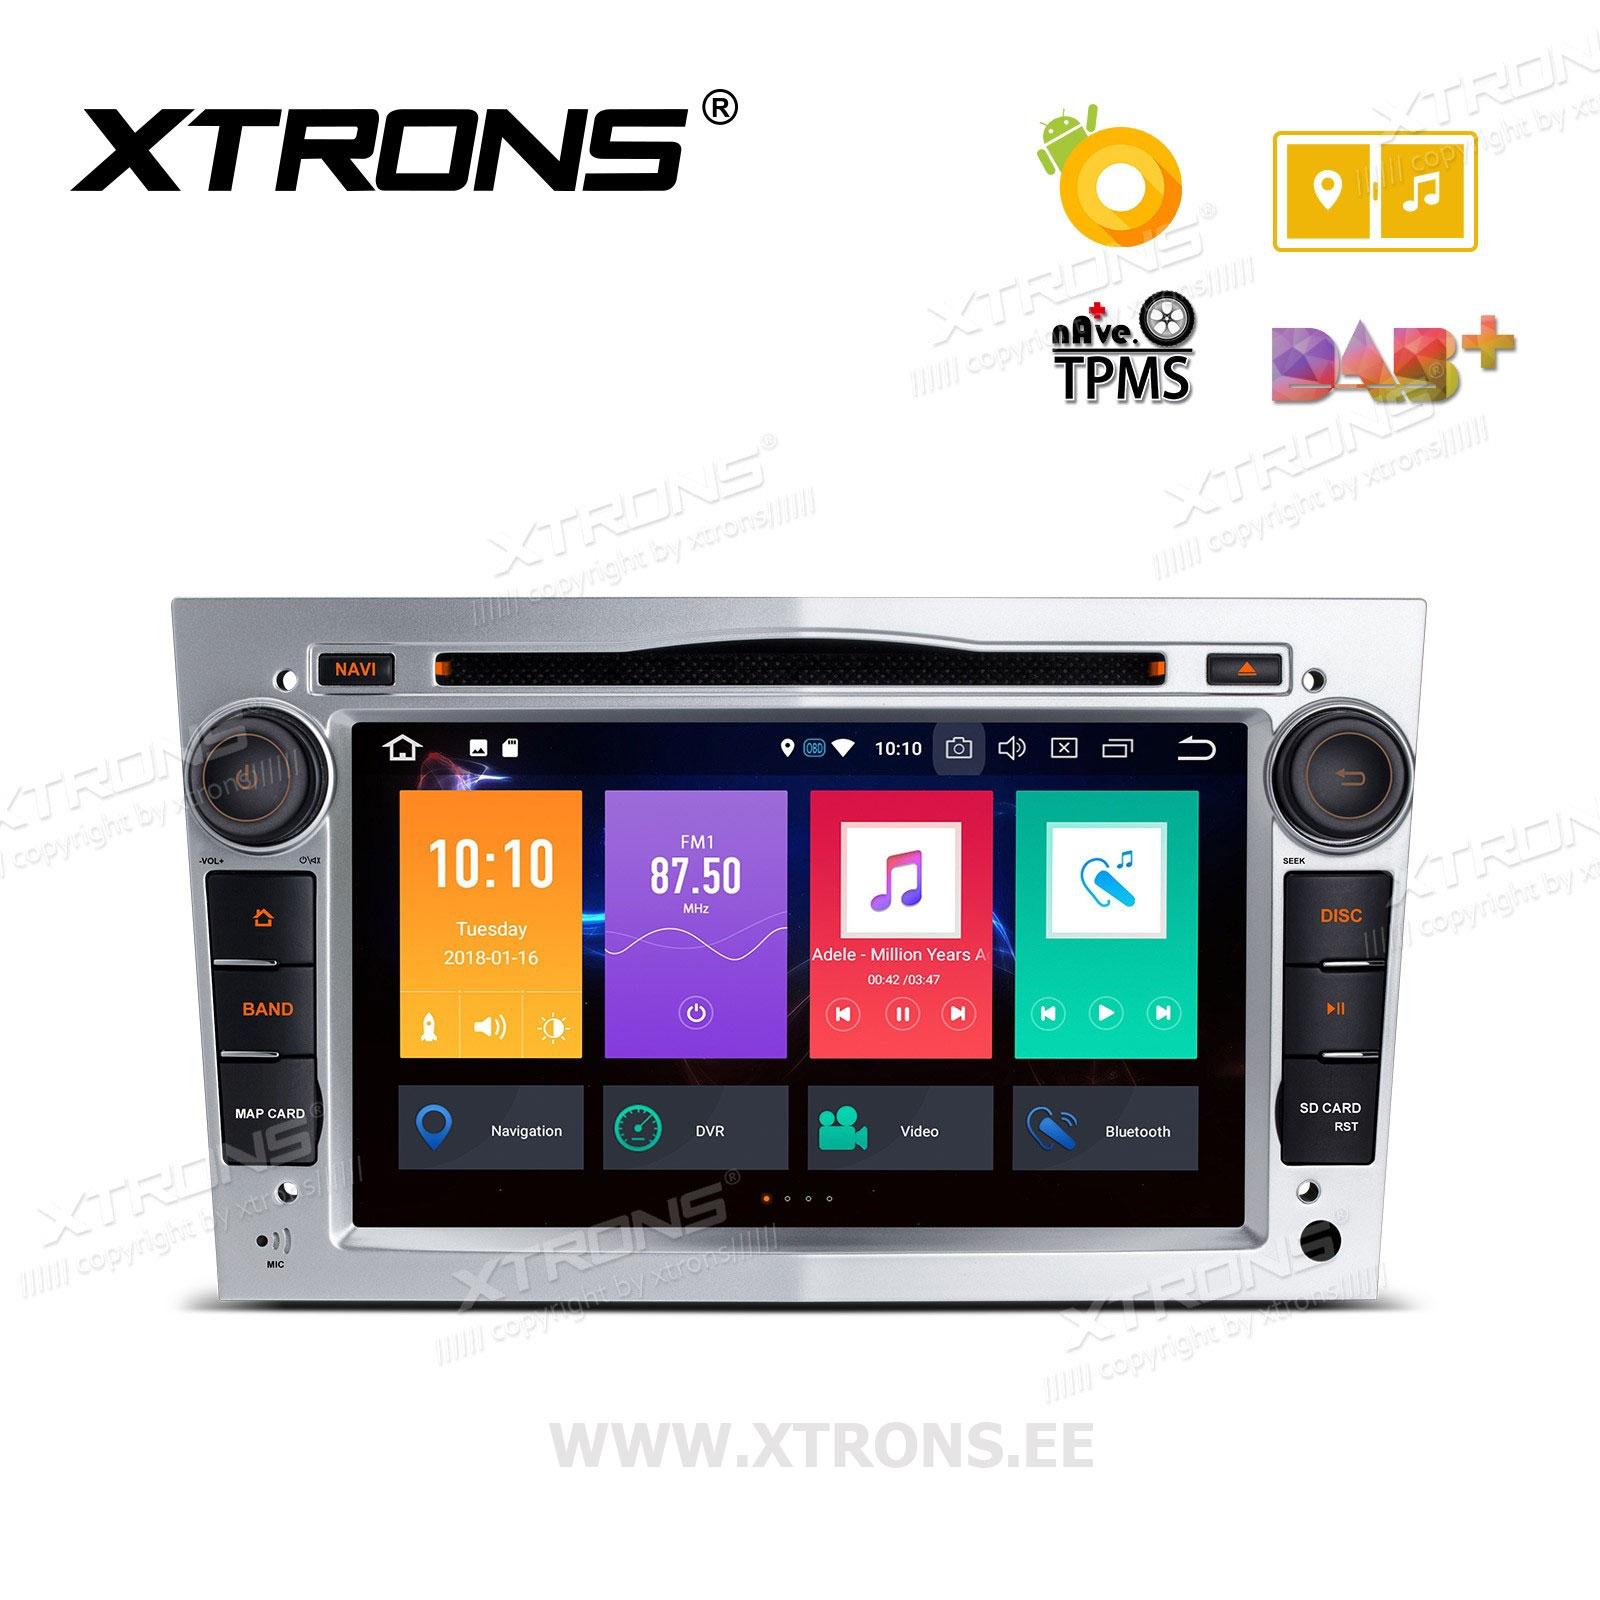 XTRONS PB78OLOP-S